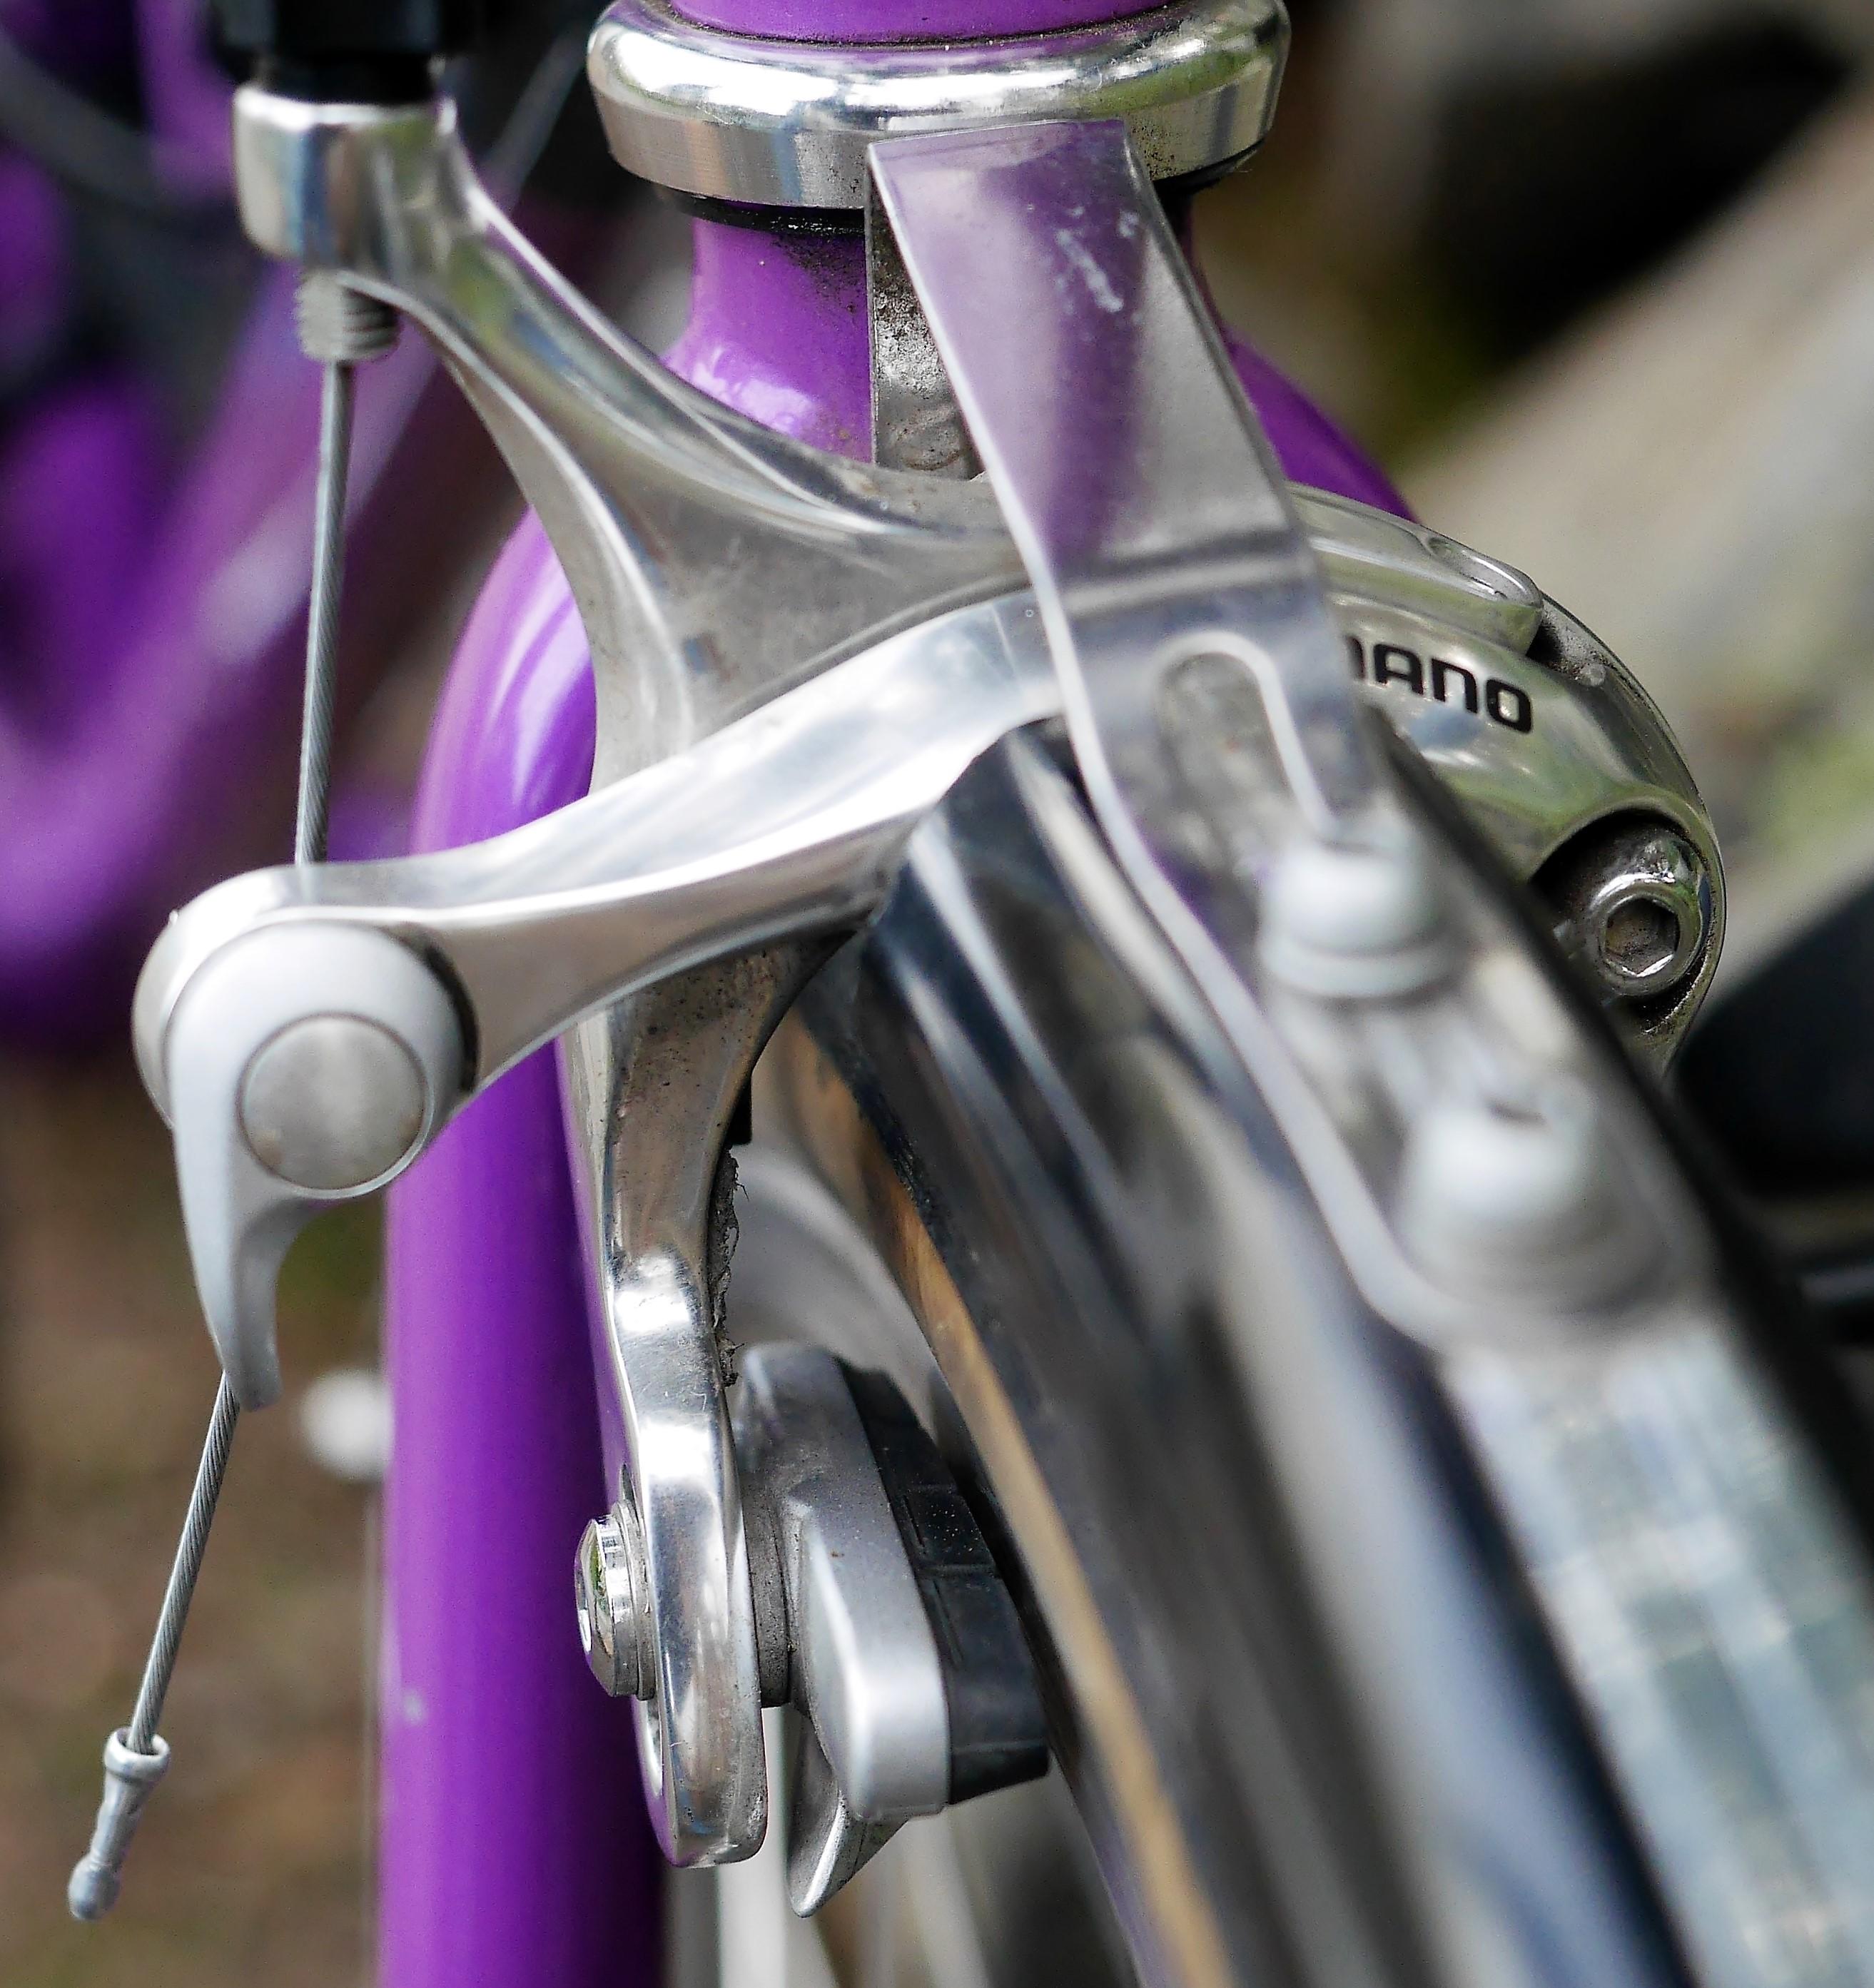 Vintage old school Cantilever Brakes purple  ATB